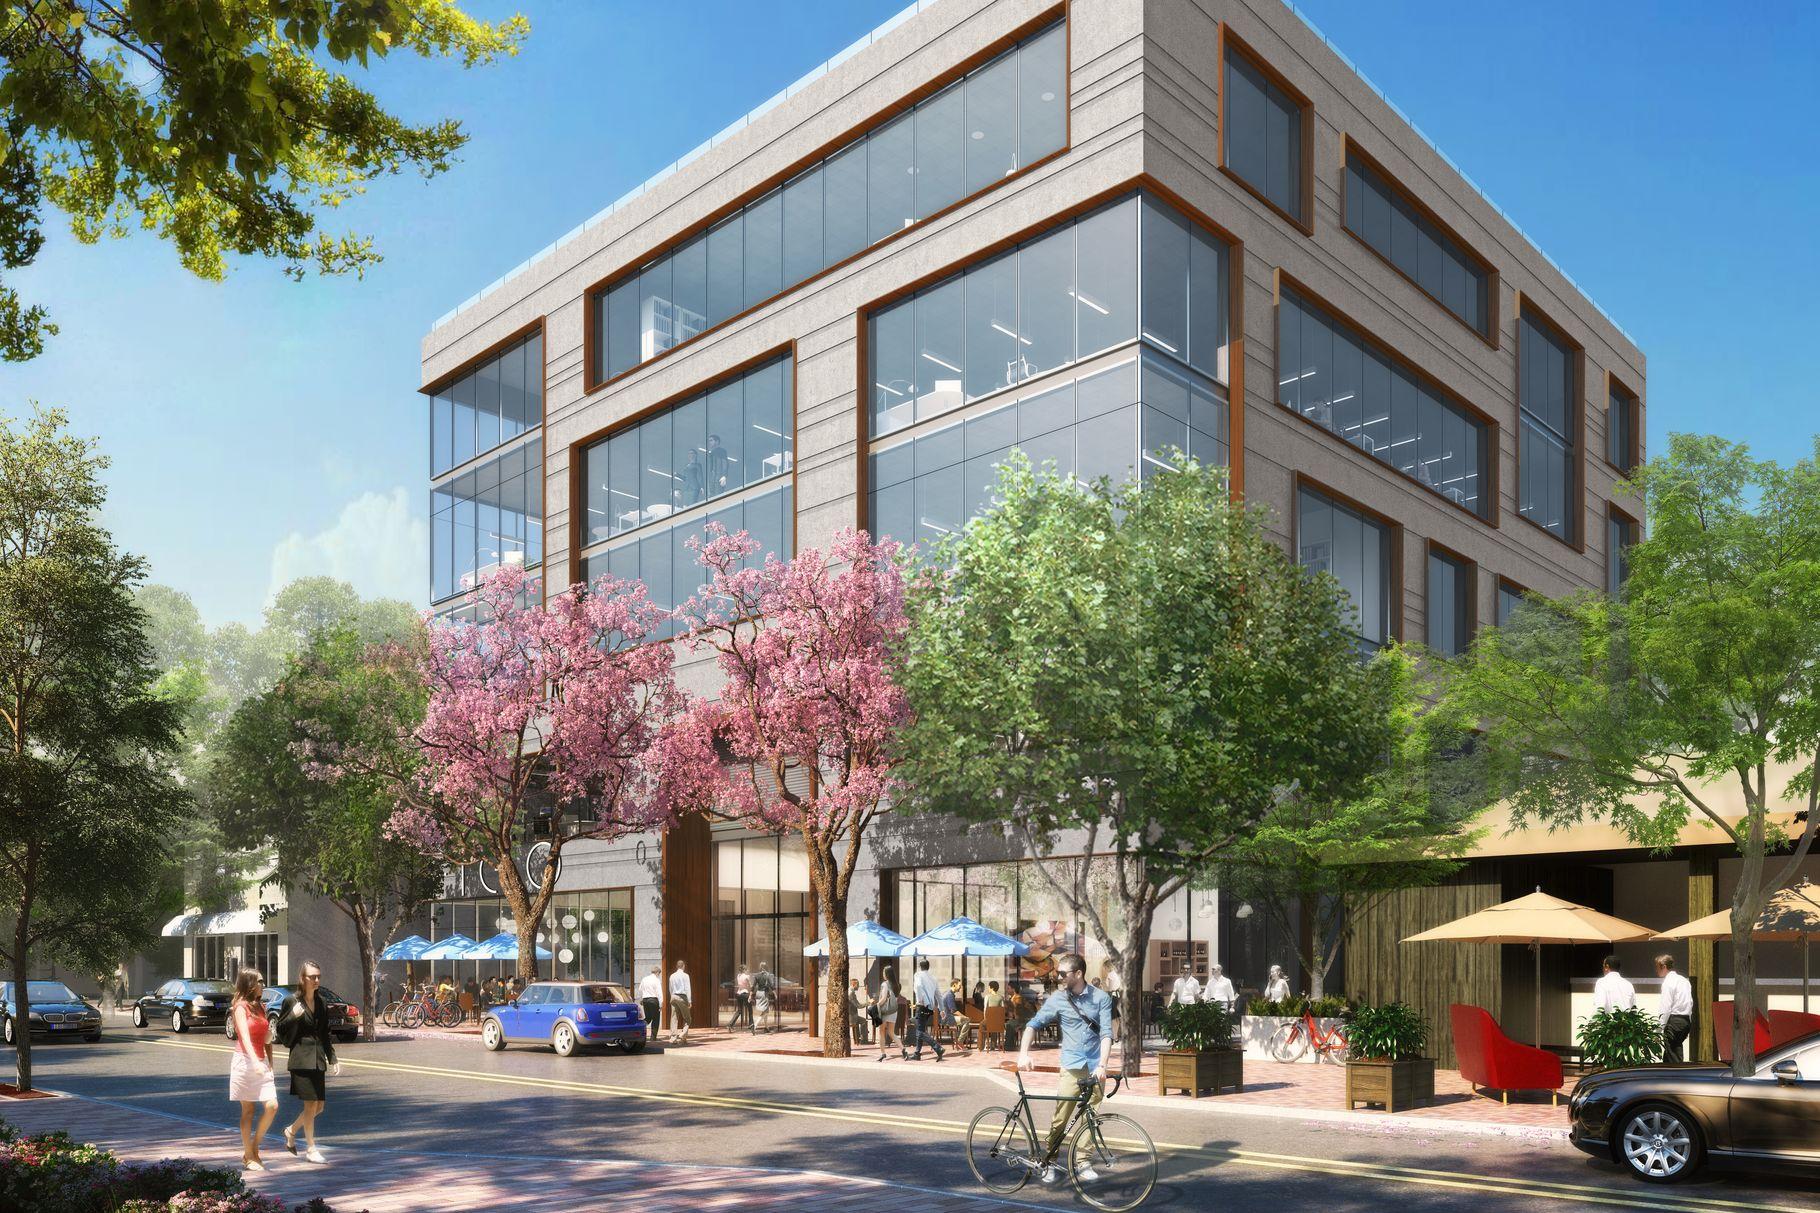 The Optimum, Coconut Grove's New Arquitectonica Designed Office Development Breaks Ground